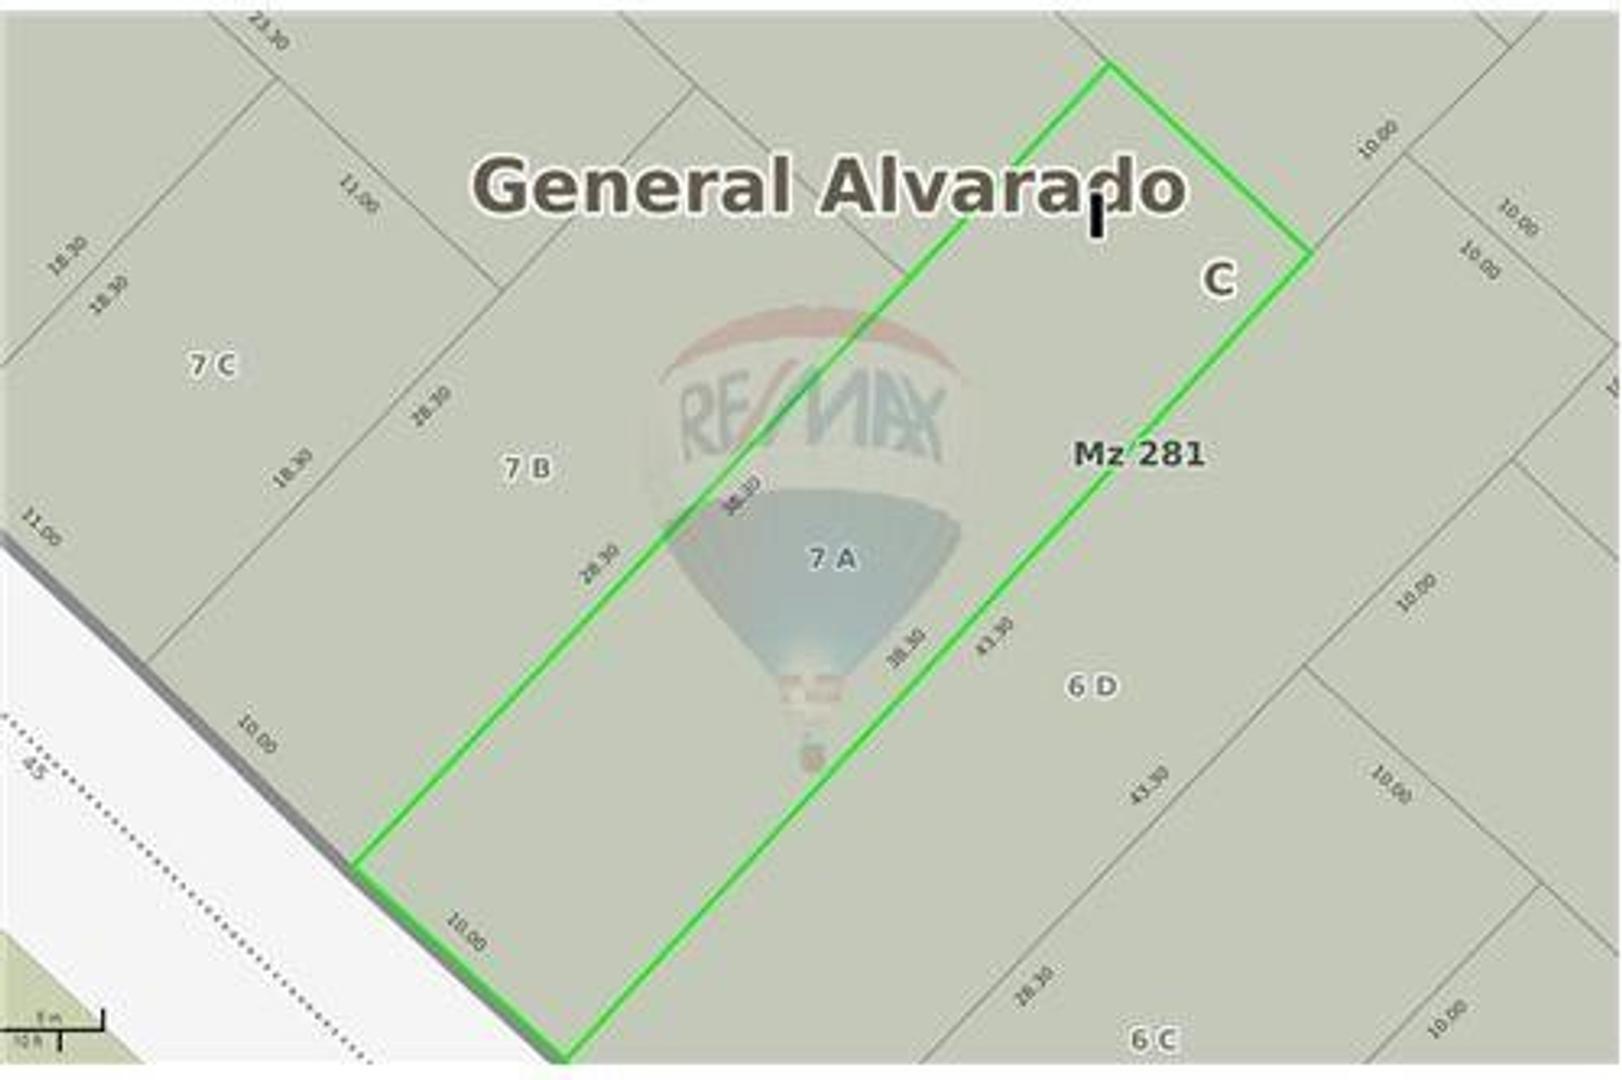 Terreno 380 m2 a 2 cuadras del Mar en Miramar